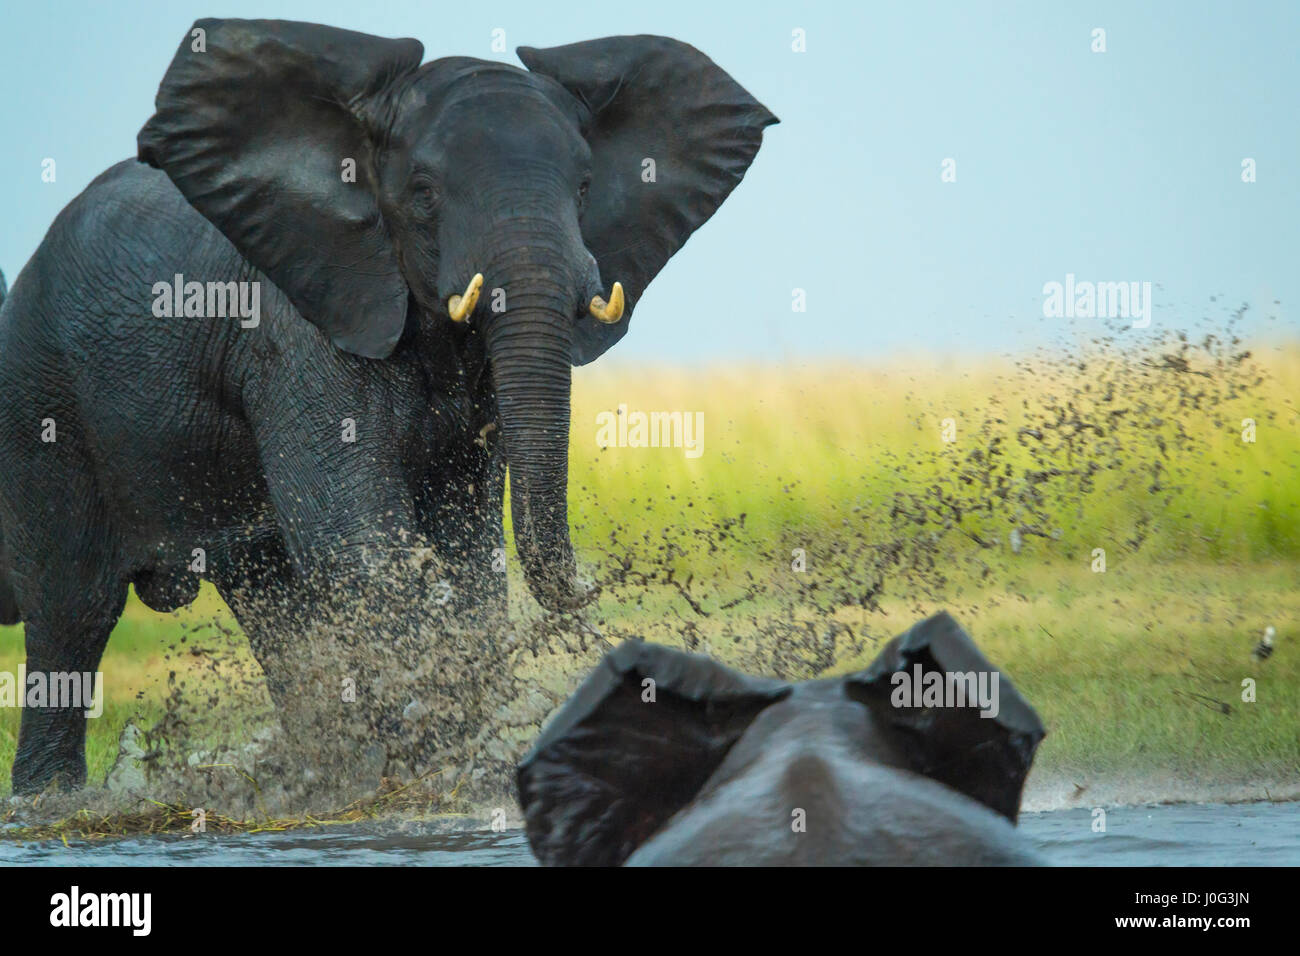 Elephant riprodurre la carica altro elefante, Chobe Nat Pk, Botswana, Africa Immagini Stock